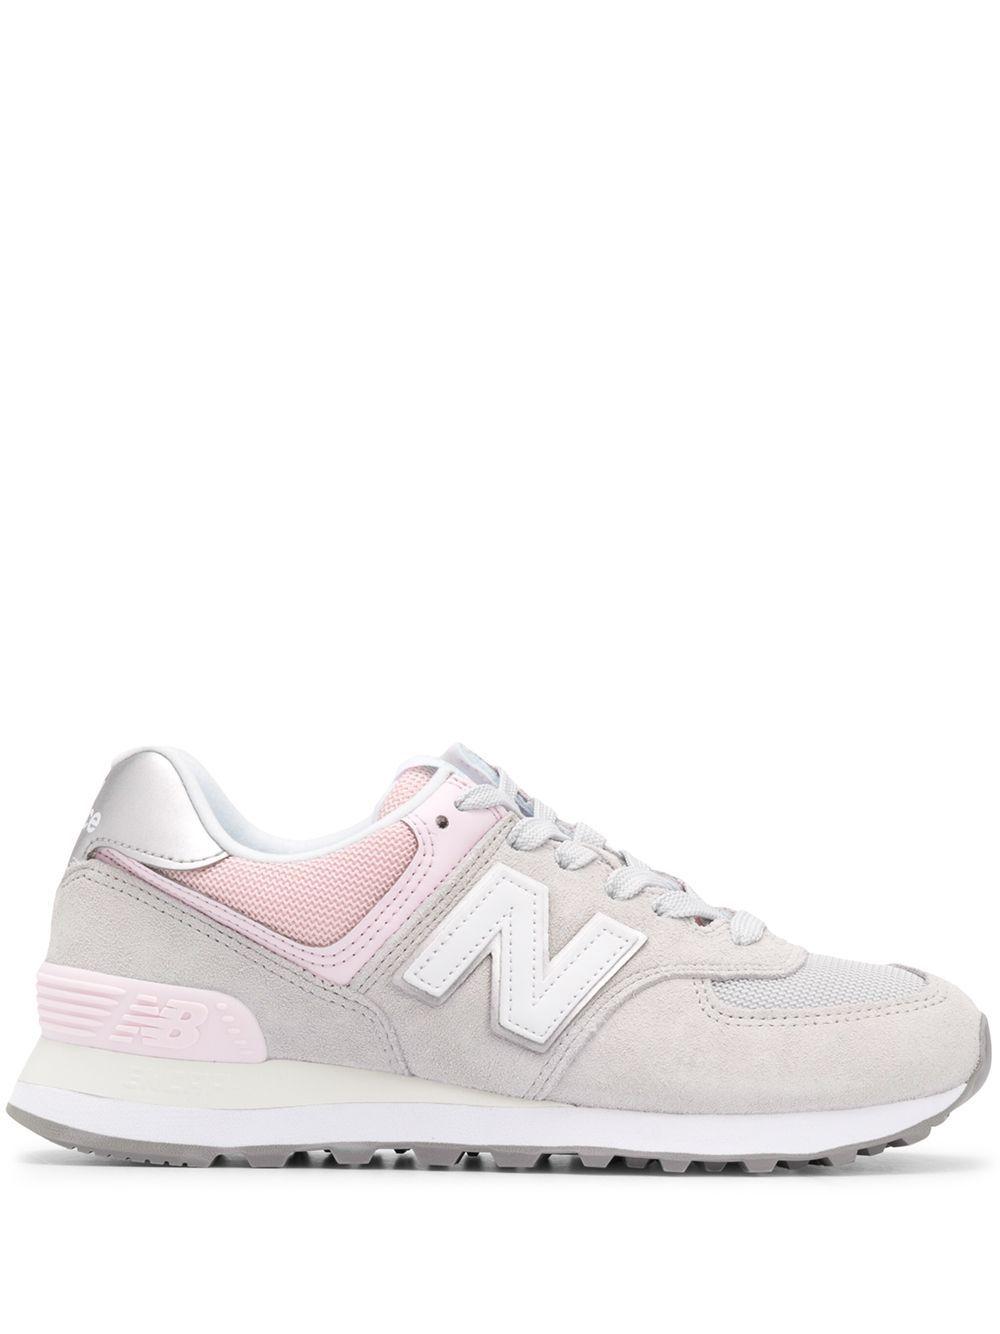 new balance 574 gris rosa